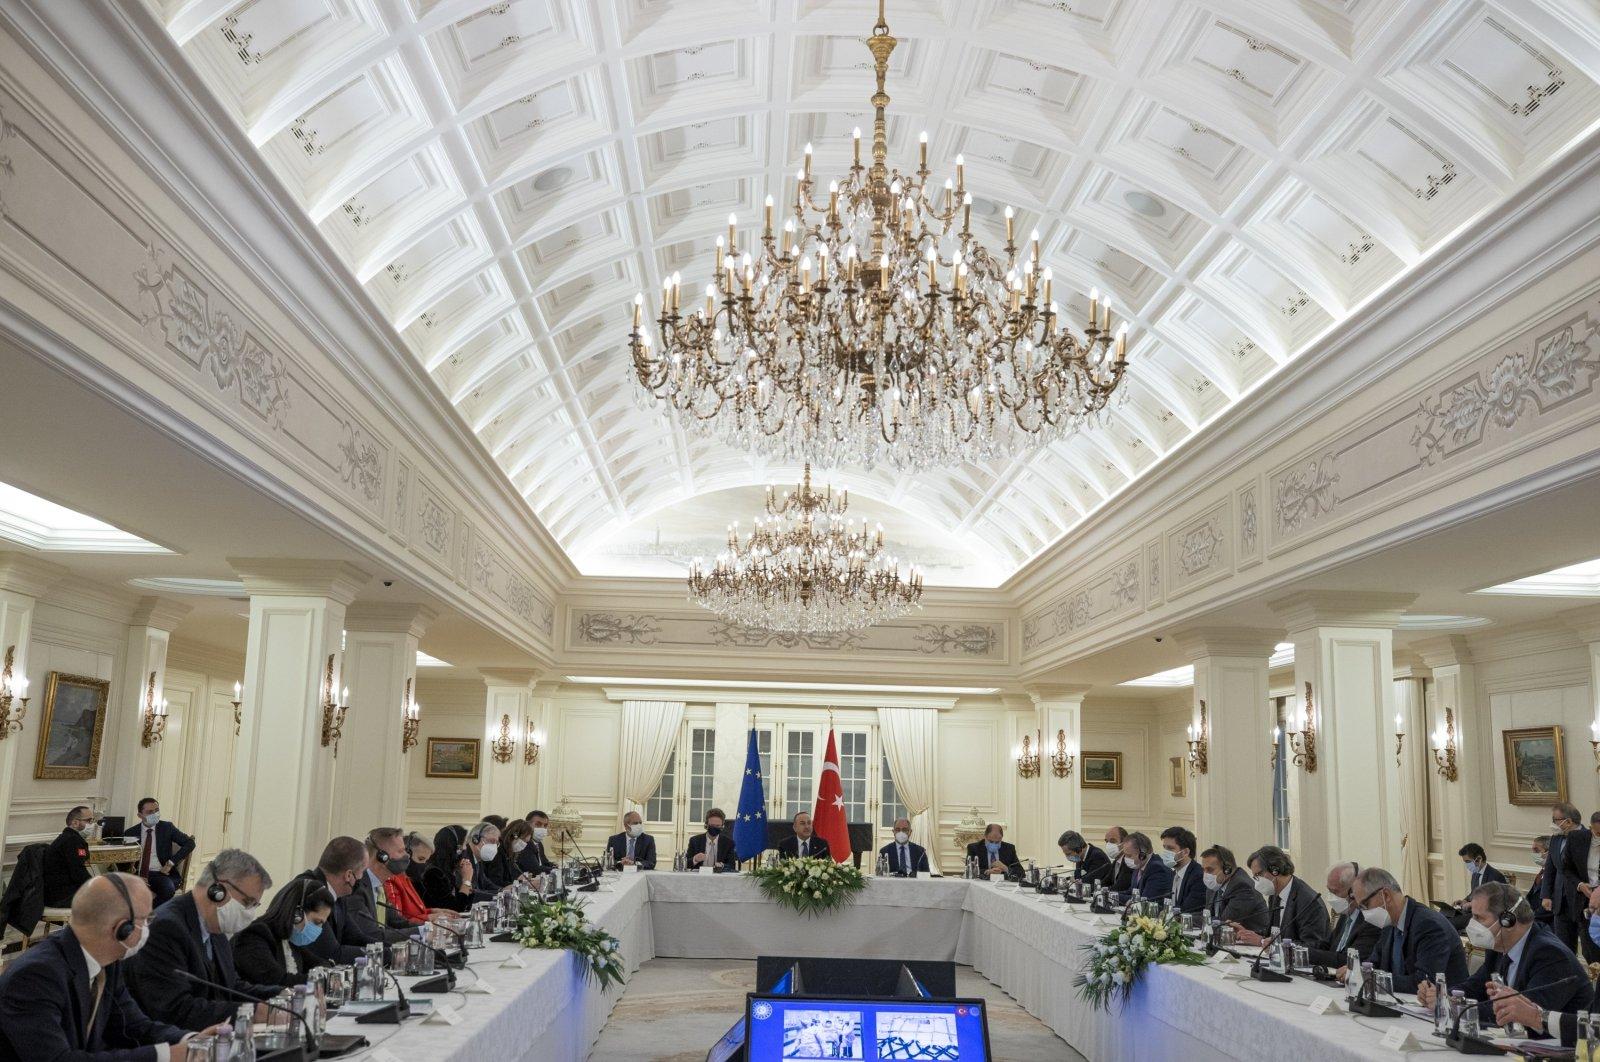 Foreign Minister Mevlüt Çavuşoğlu (C) holds a meeting with European Union ambassadors in the capital Ankara, Turkey, Jan. 12, 2021. (AA Photo)